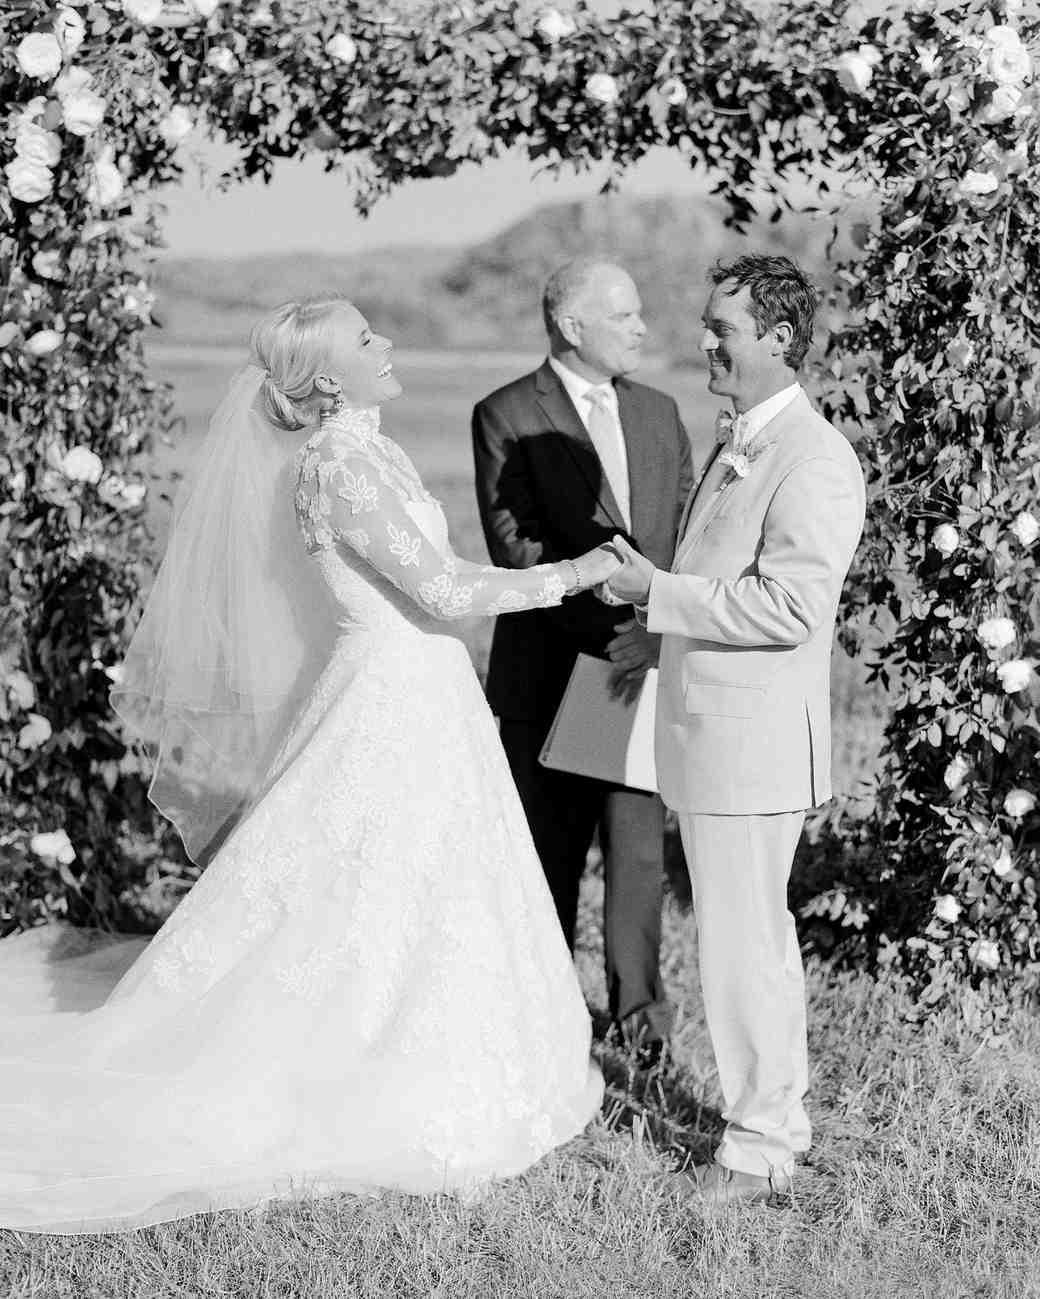 bessie john wedding ceremony